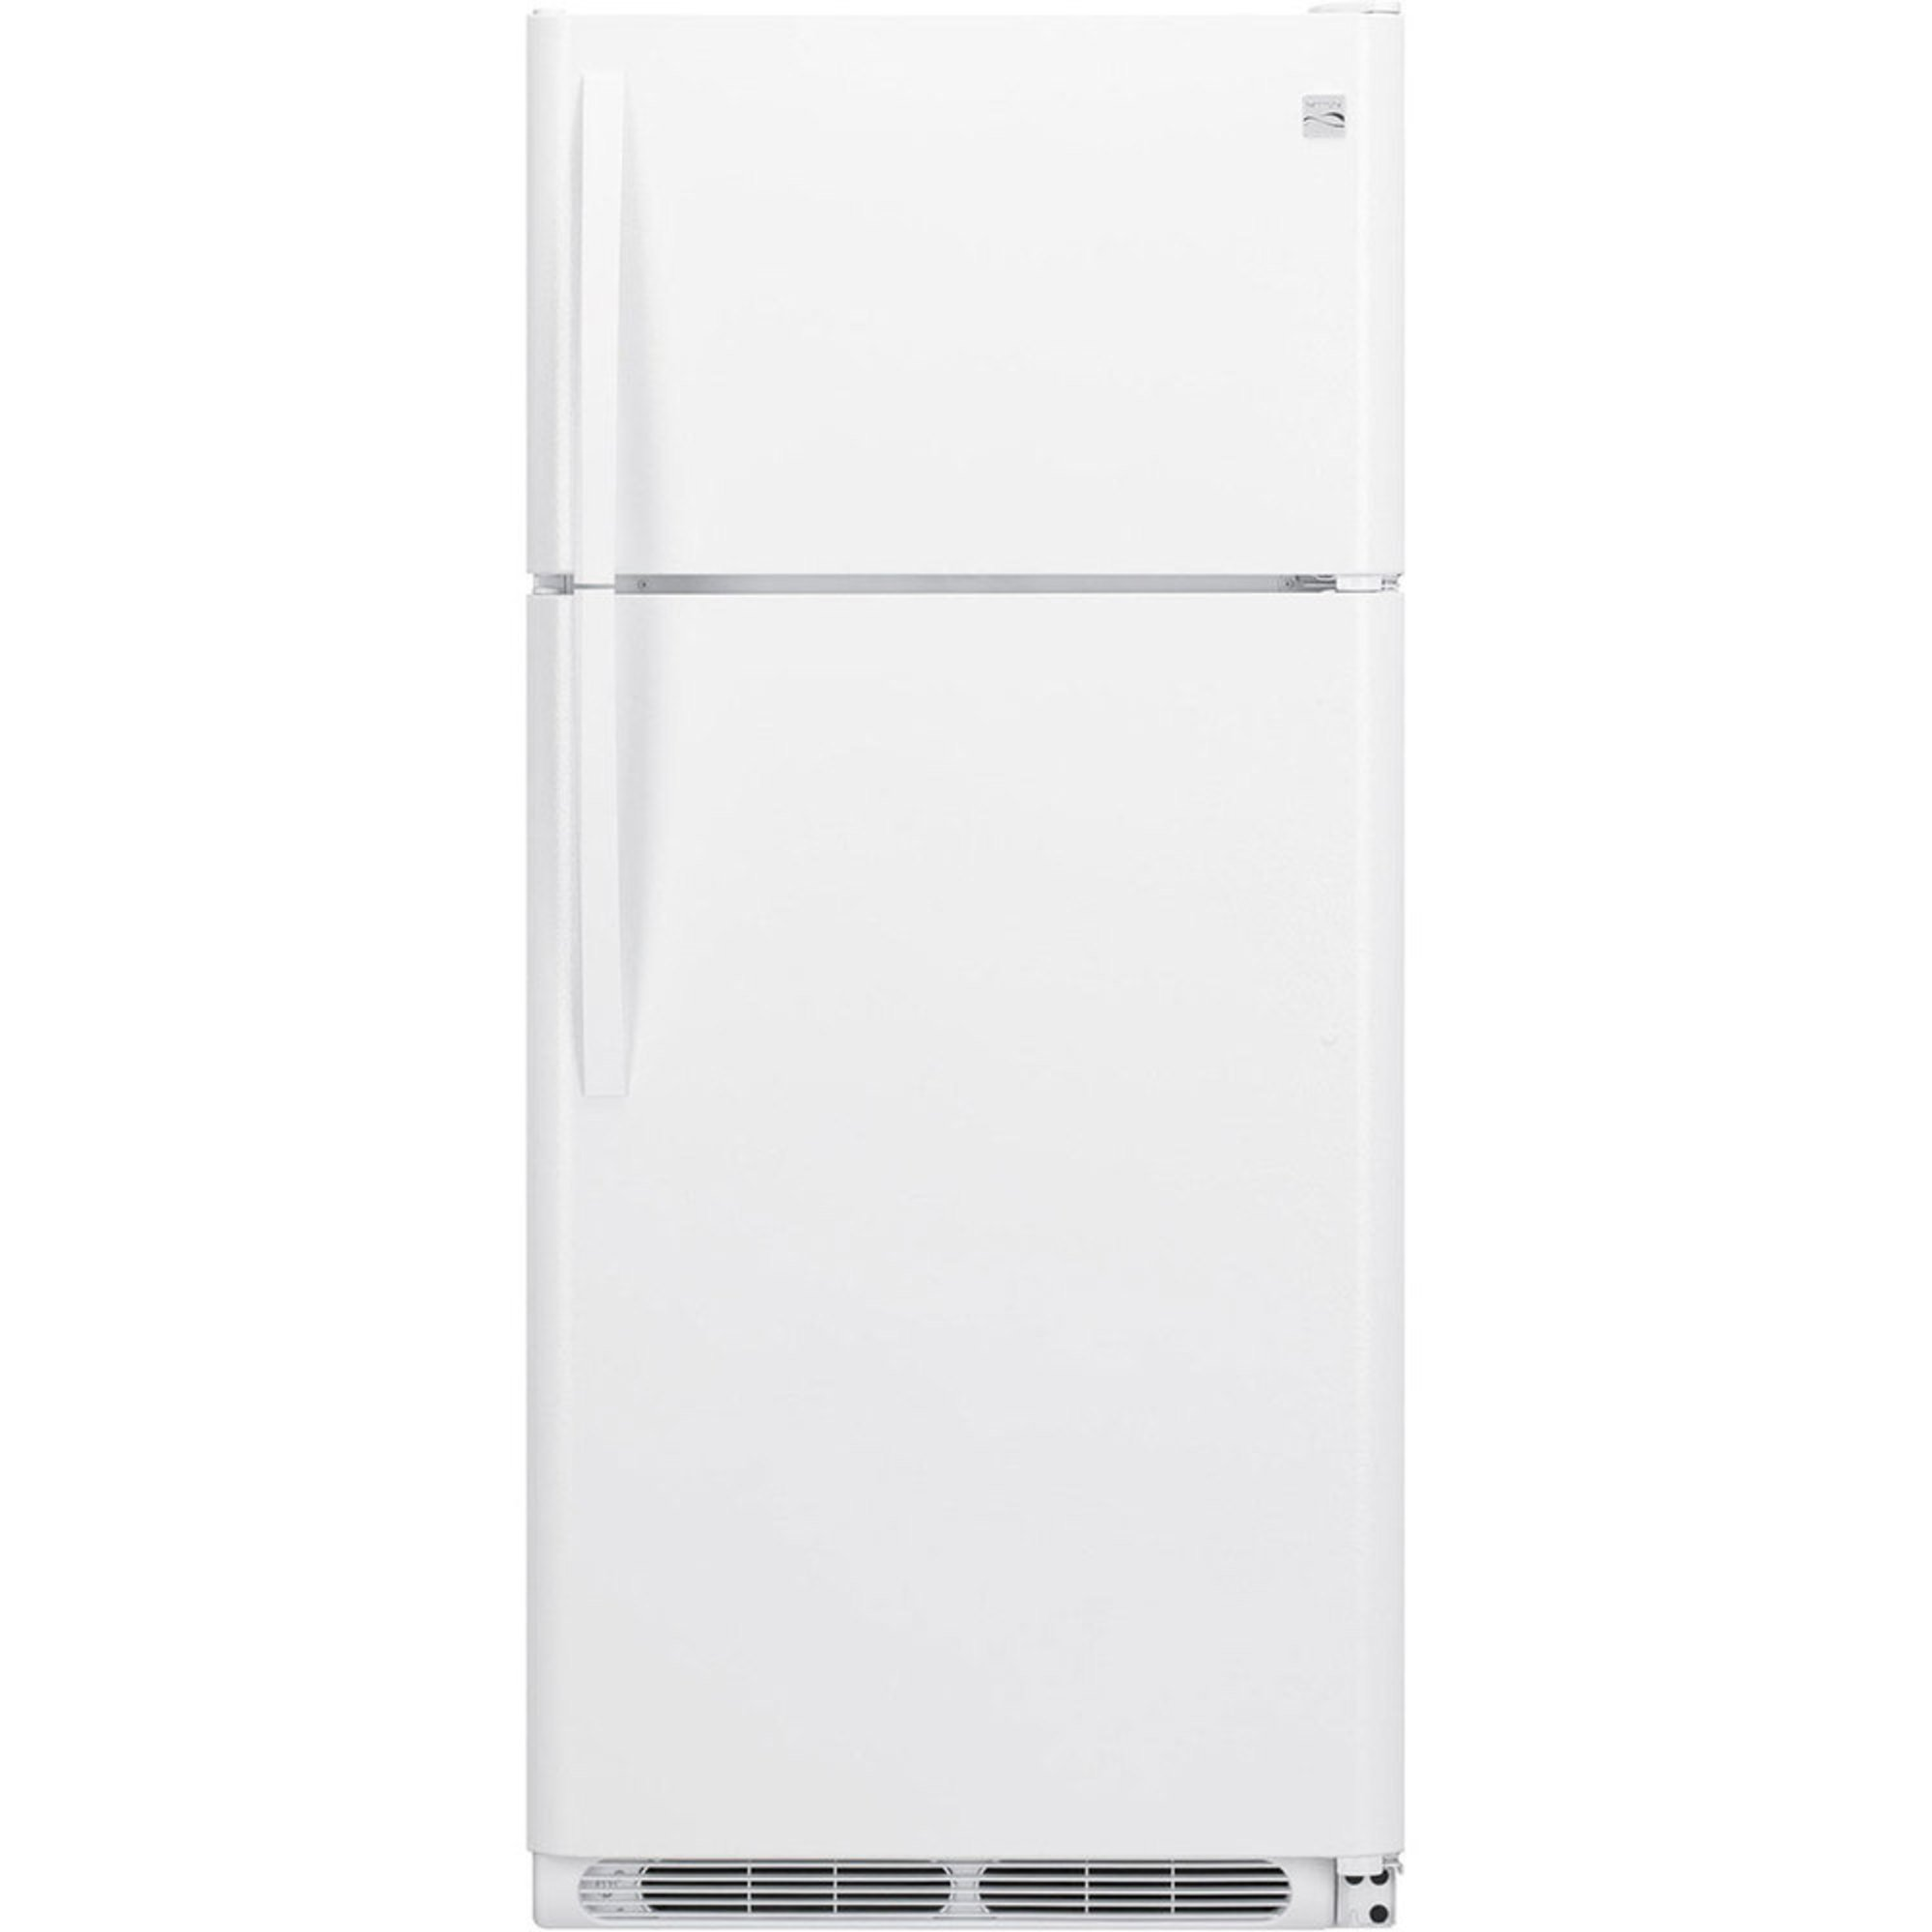 Kenmore 18-cu.ft. Top-freezer Refrigerator W/ Wire Shelves, White ...